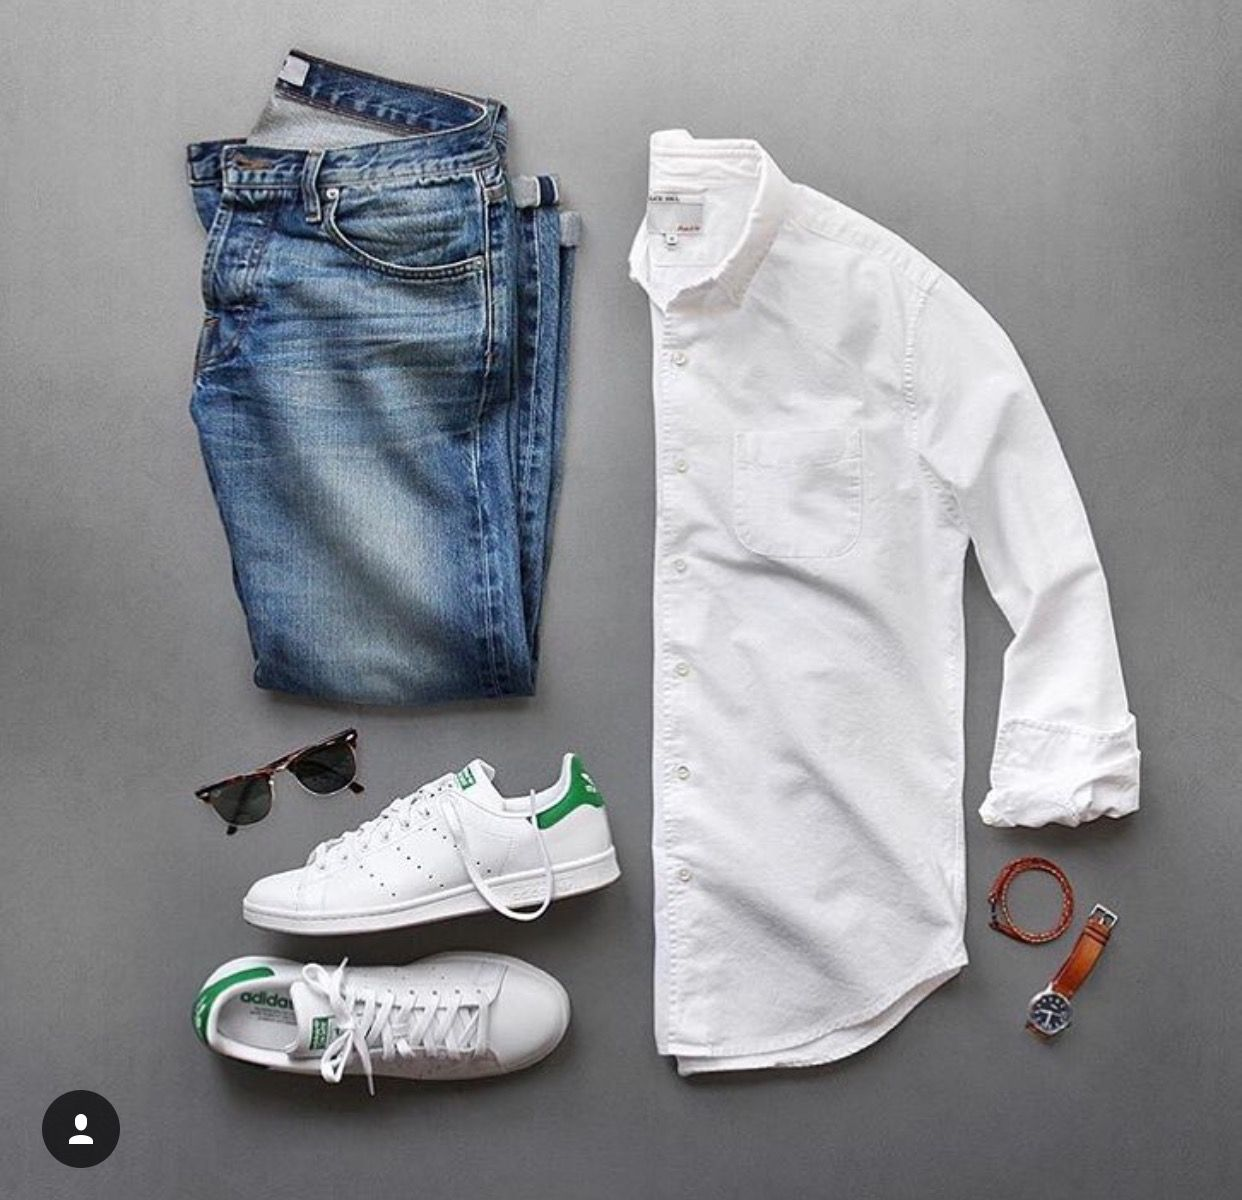 Wear Blanca Adidas Camisa This Smith Pinterest I Can Stan Y 40aqwRS0